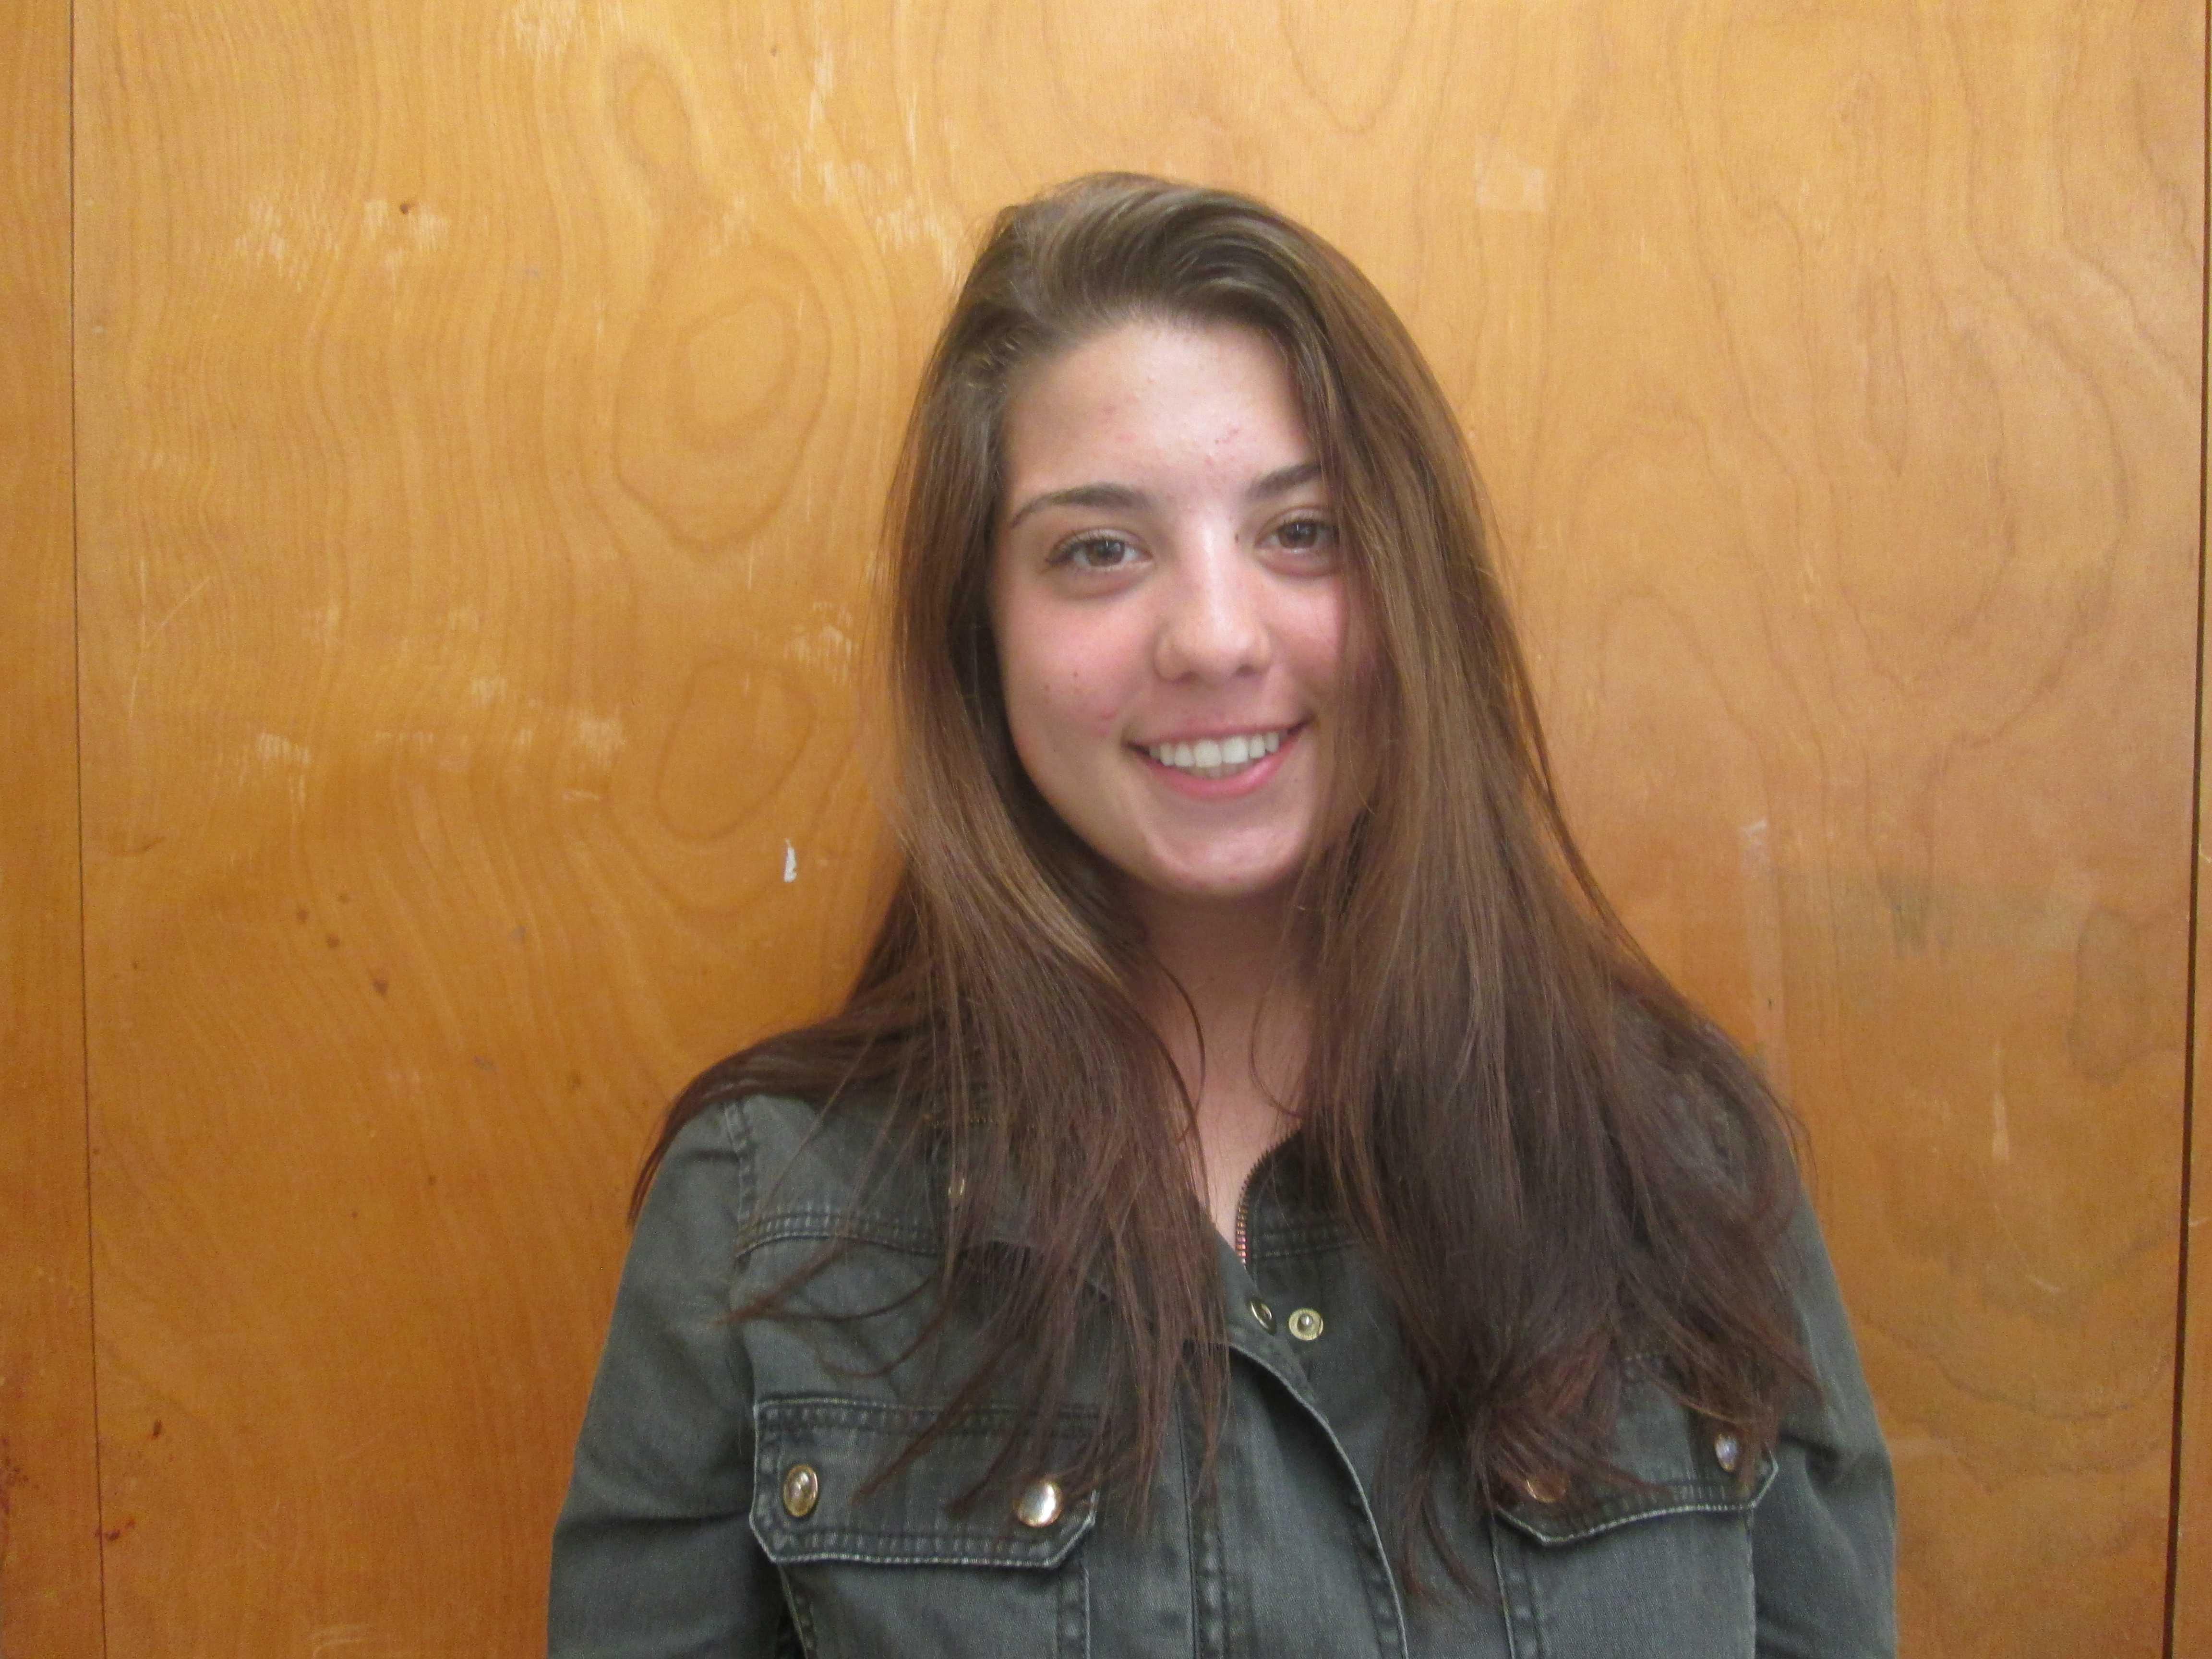 Melissa Sullivan - Gateway Community College where she will be majoring in Nursing.